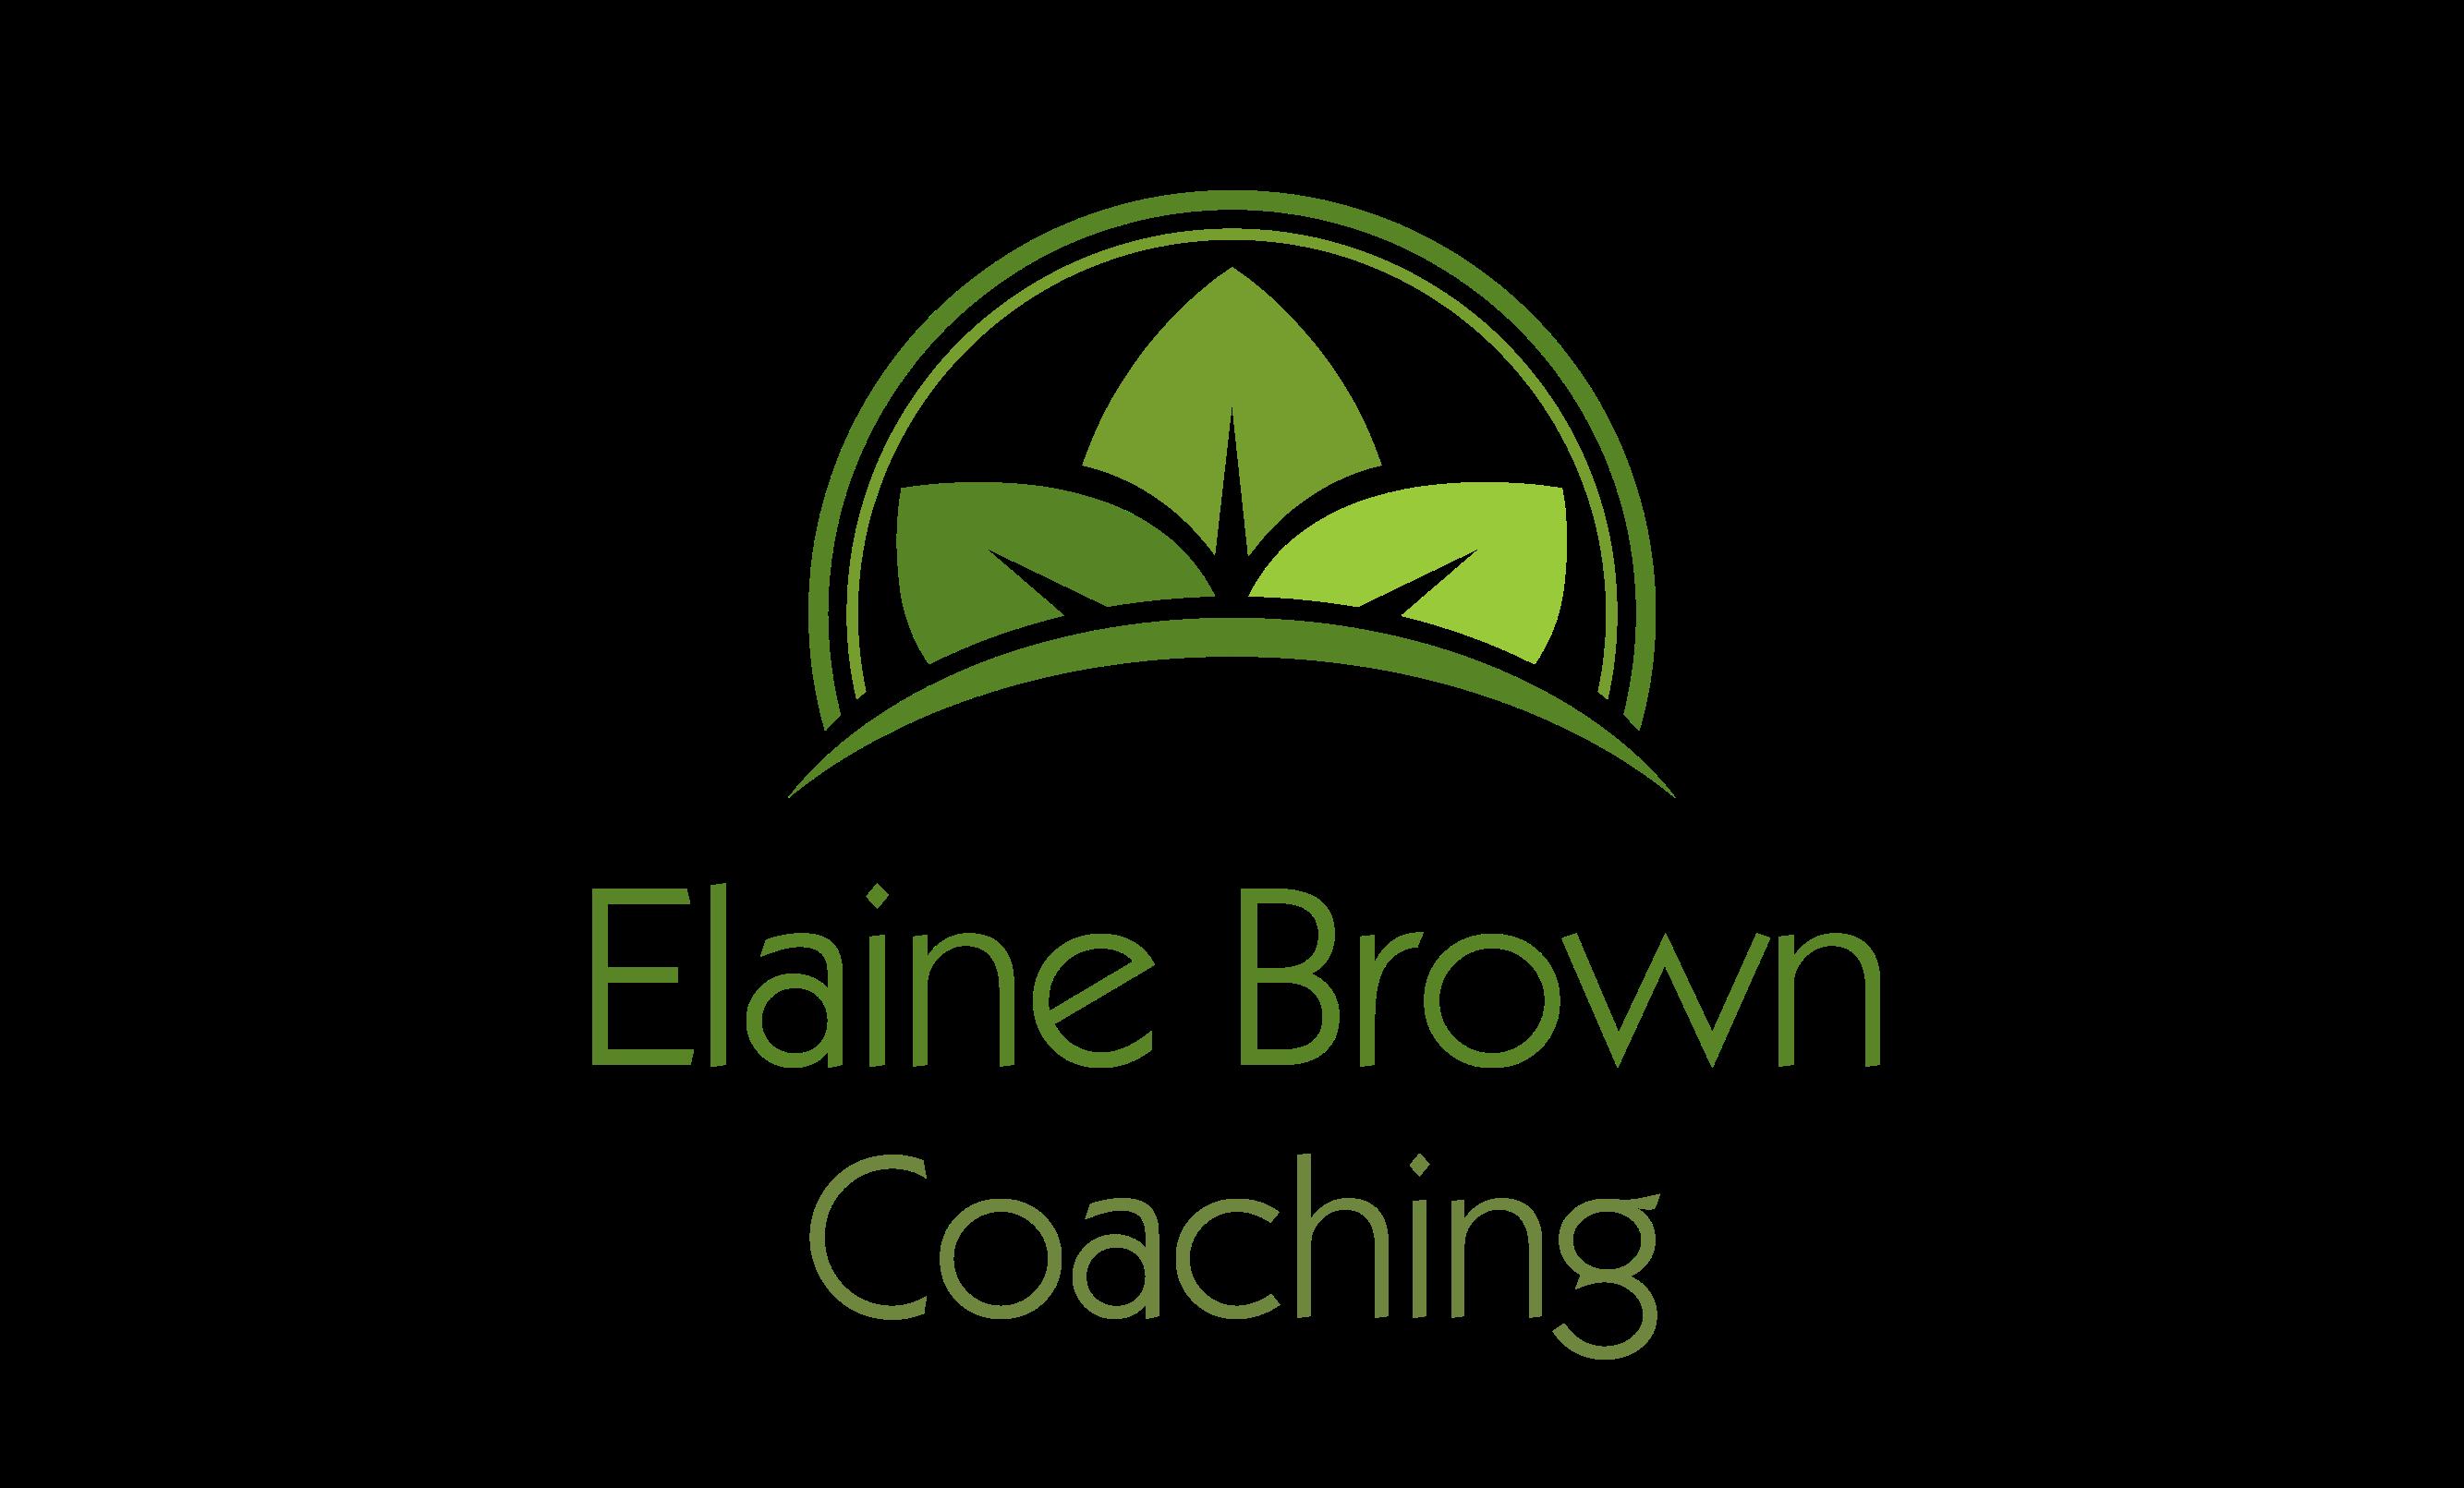 Elaine Brown Coaching